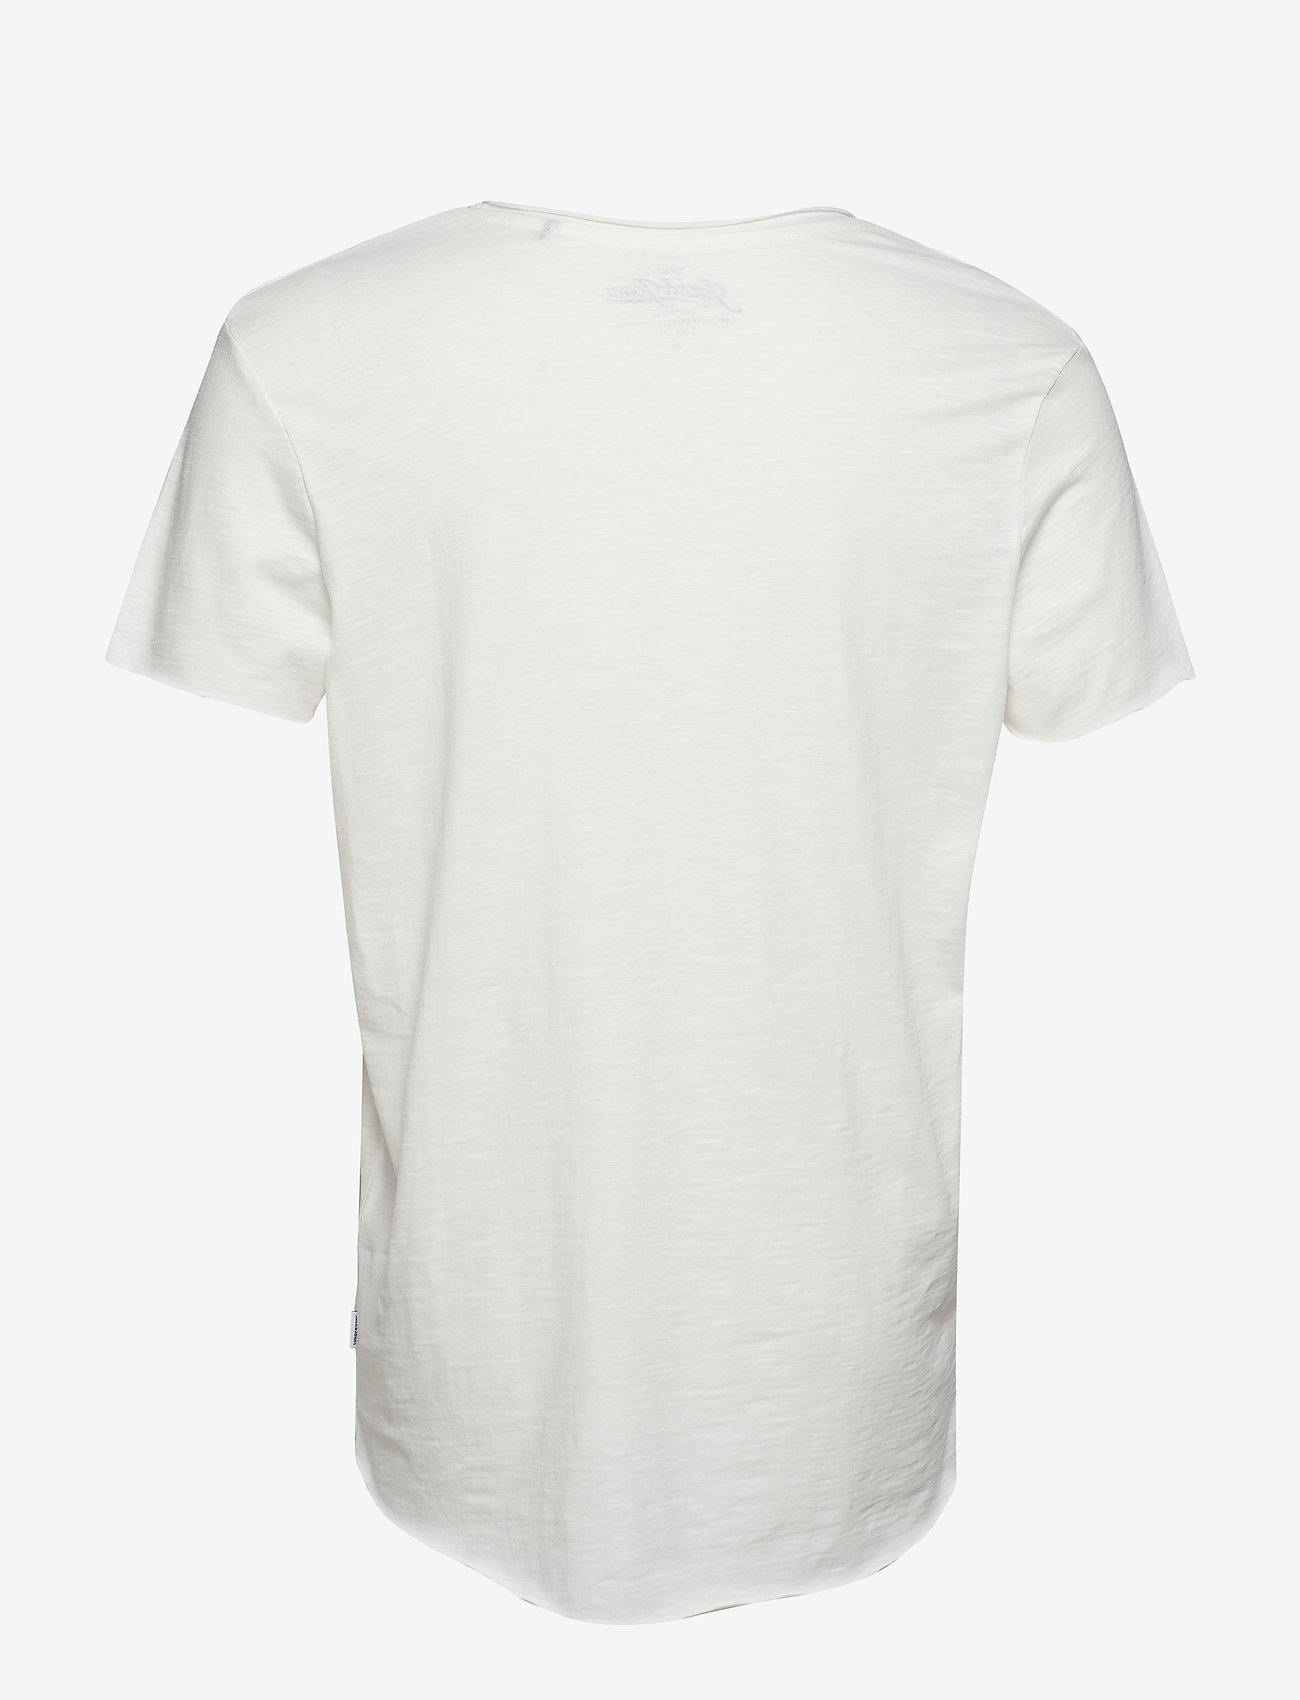 Jack & Jones - JJEBAS TEE SS U-NECK - basic t-shirts - cloud dancer - 1